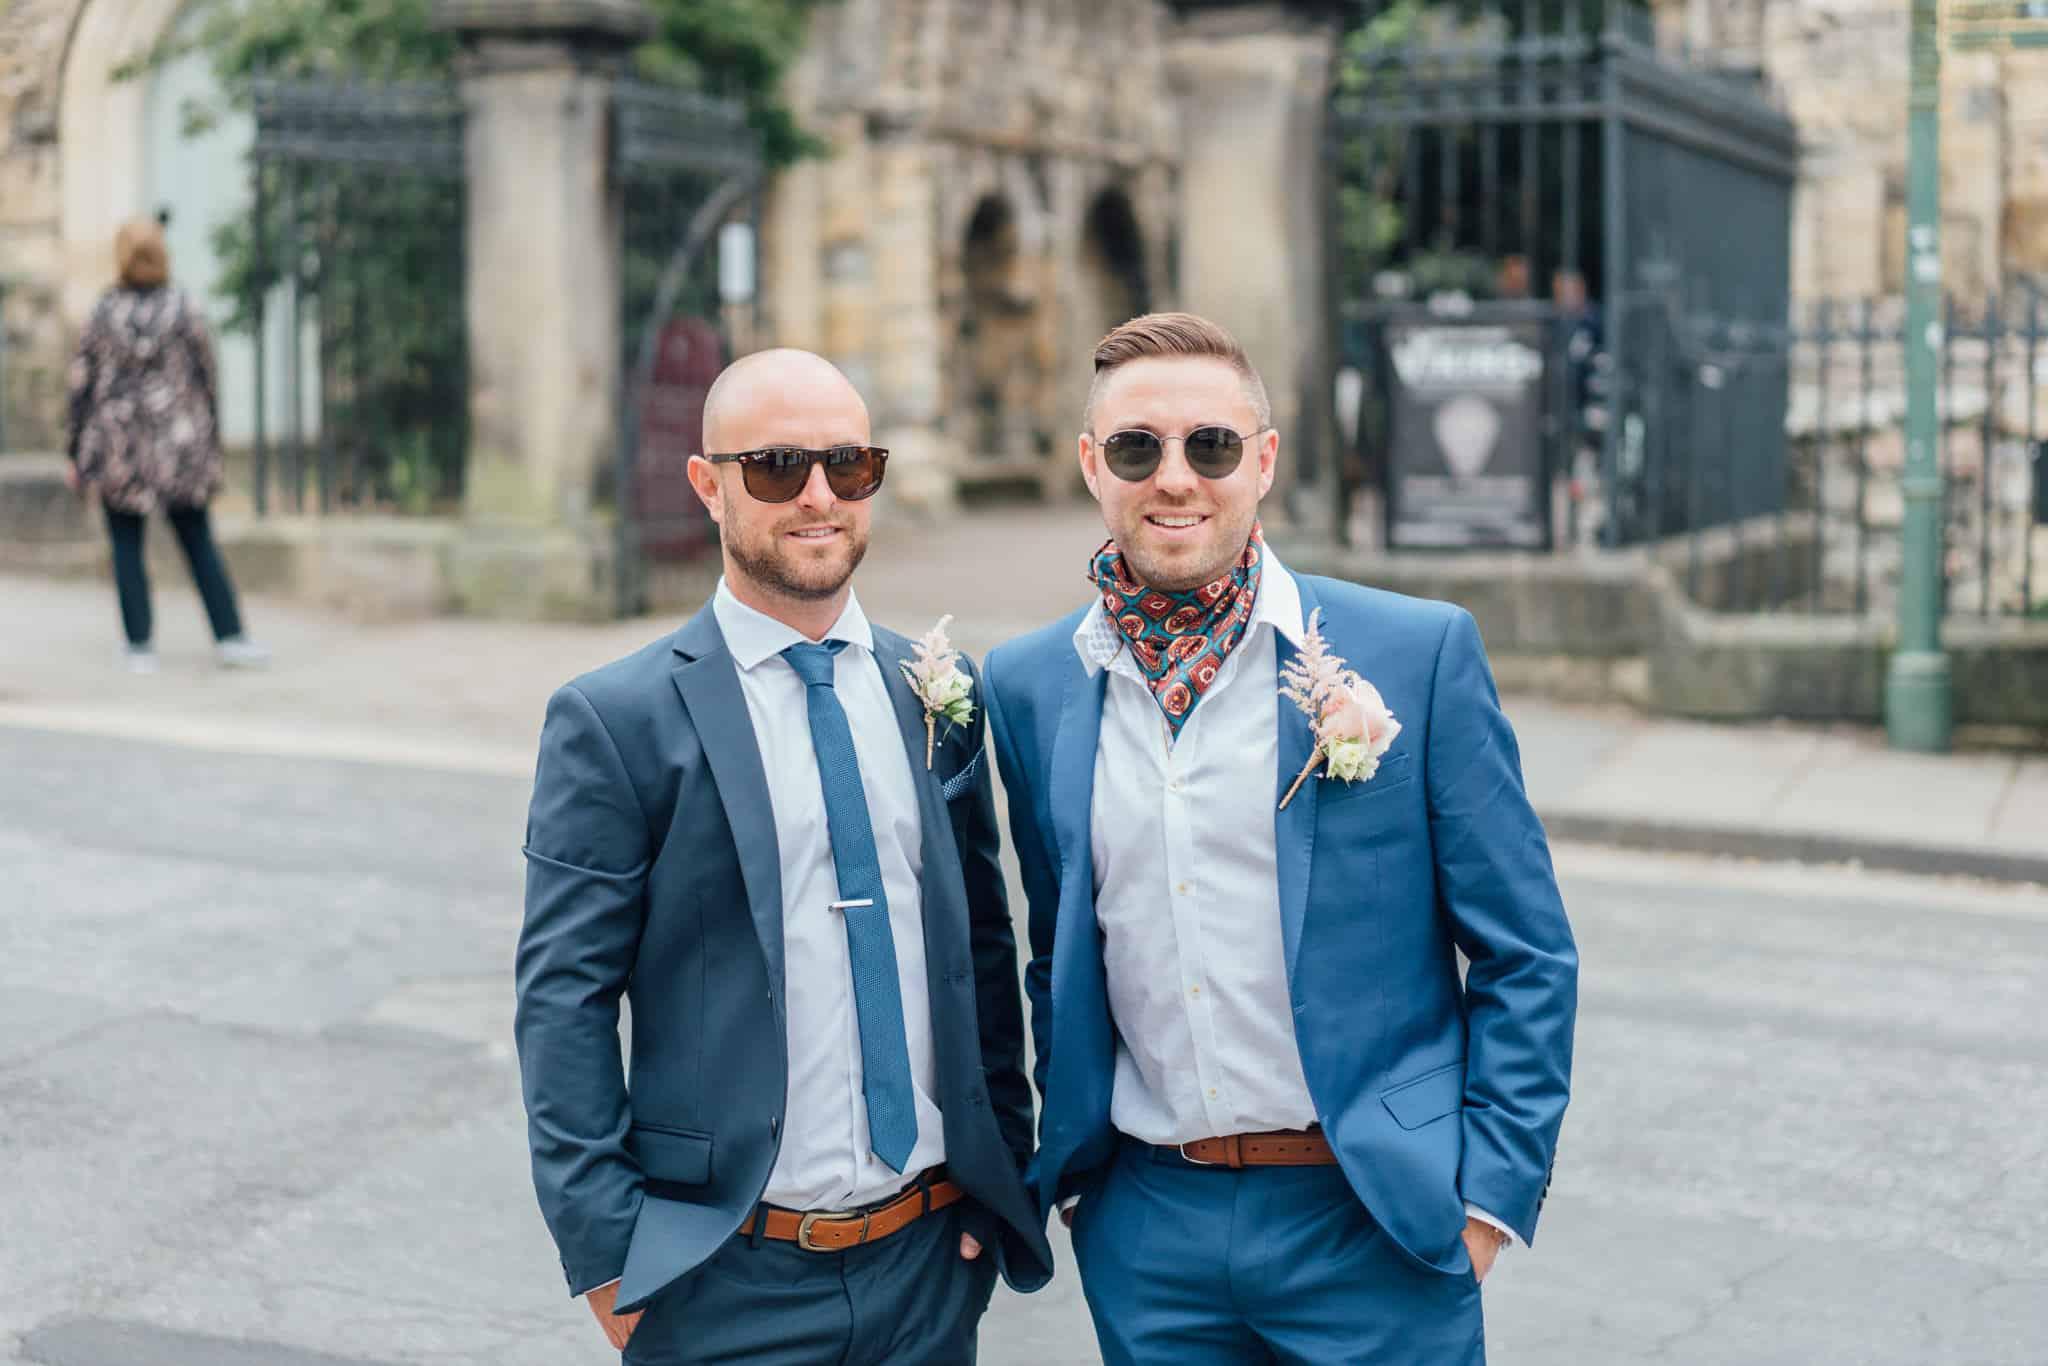 Enchanting Wedding Suit Hire Wigan Gift - Wedding Plan Ideas ...